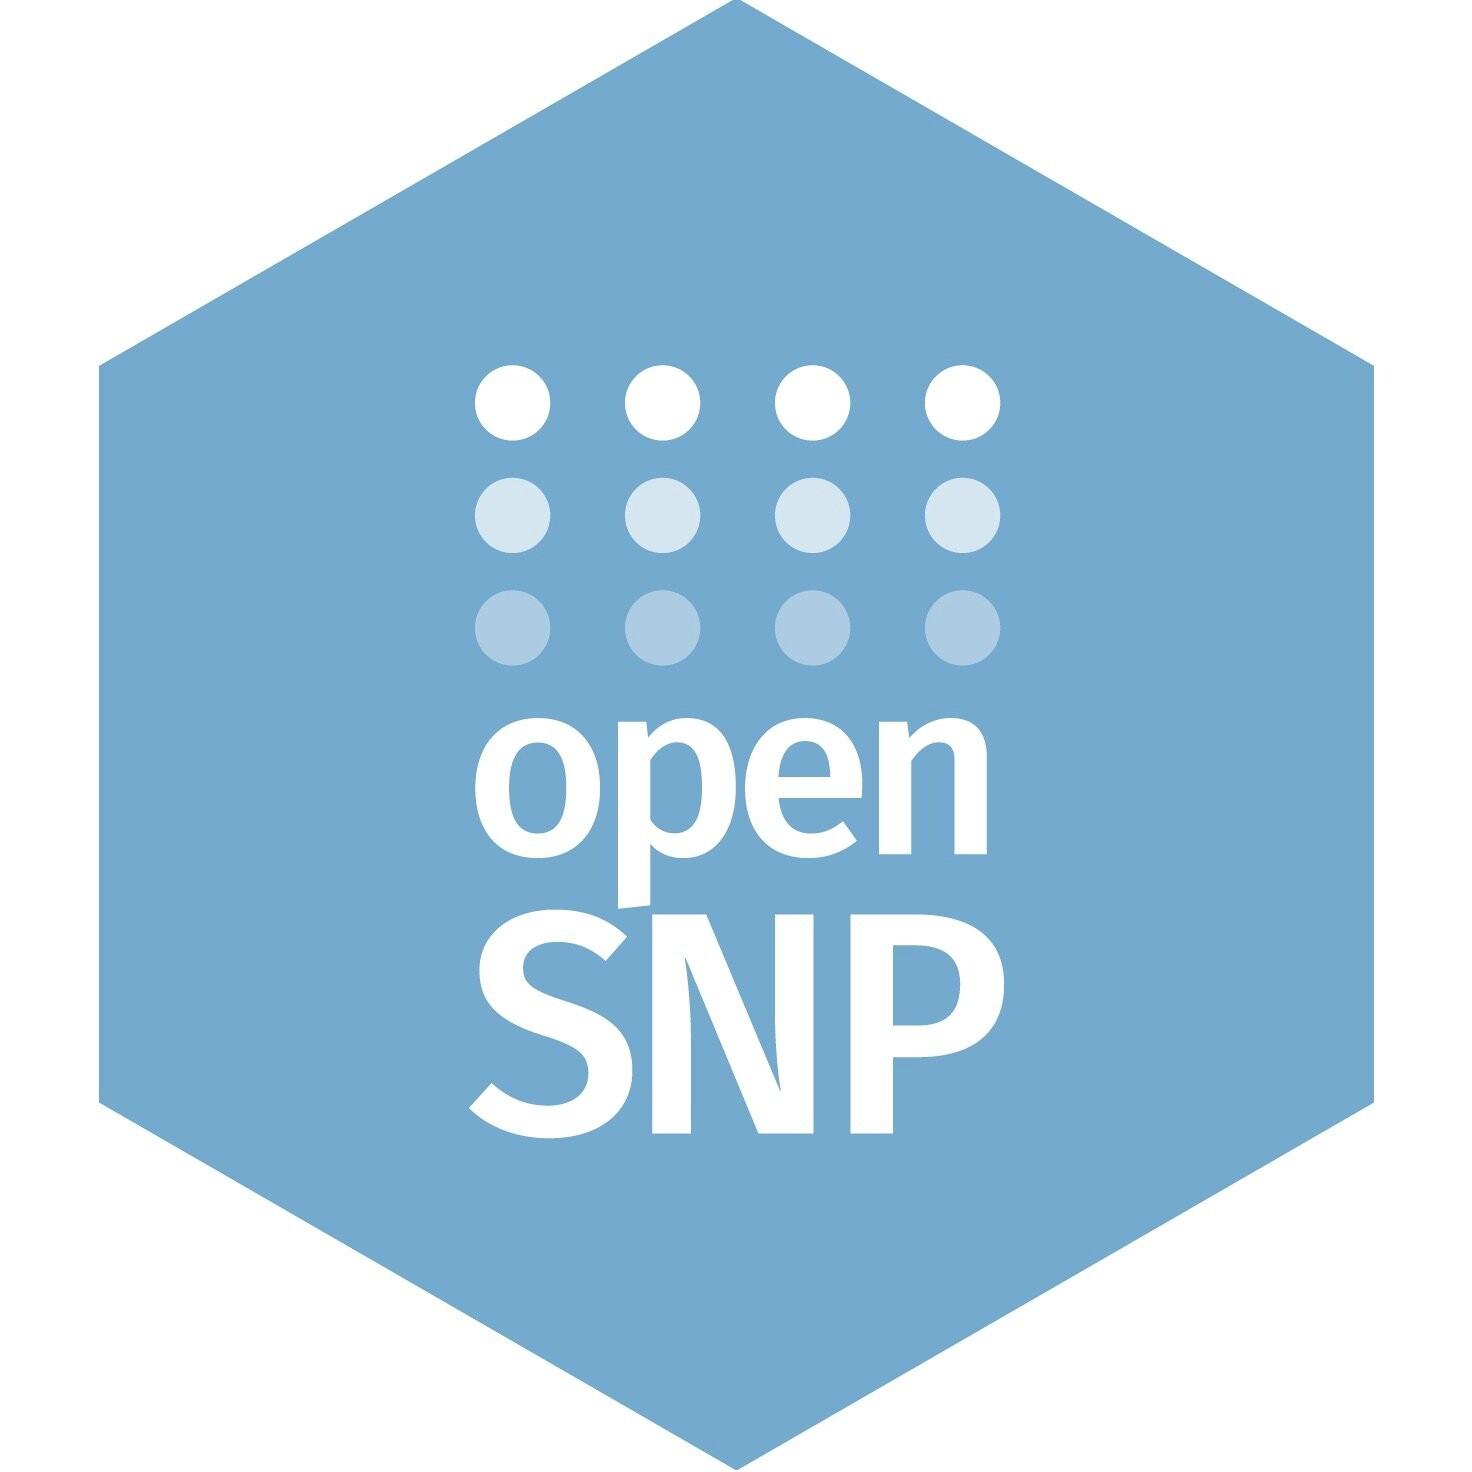 openSNP team